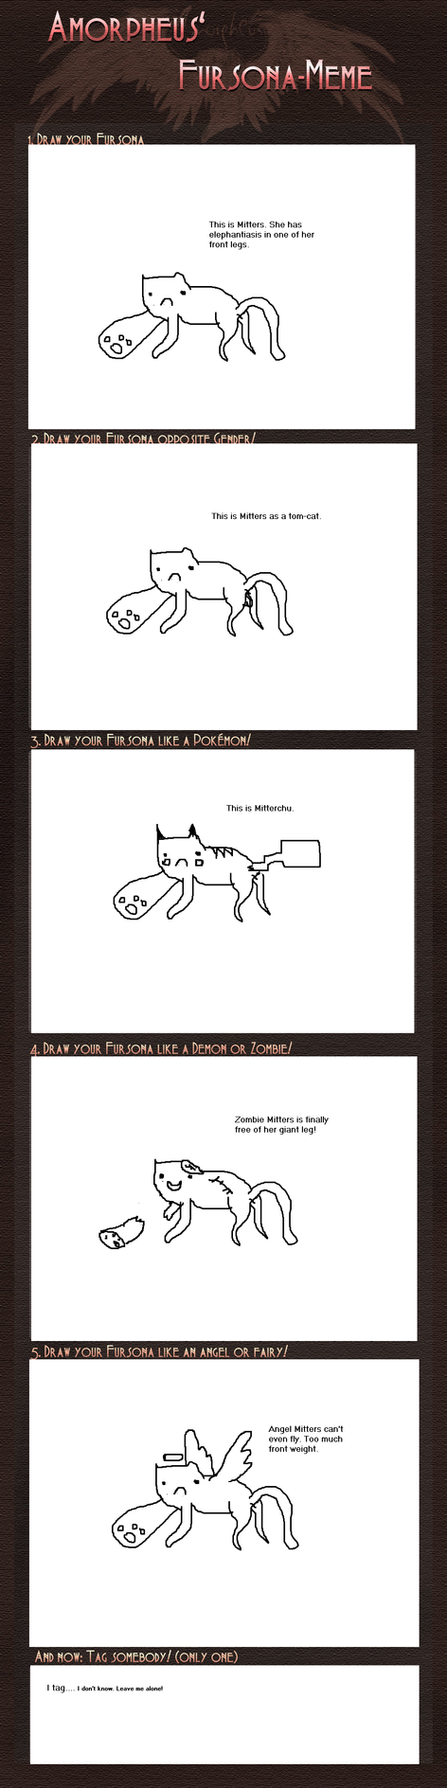 Fursona Meme by Woofs-Four-Ever